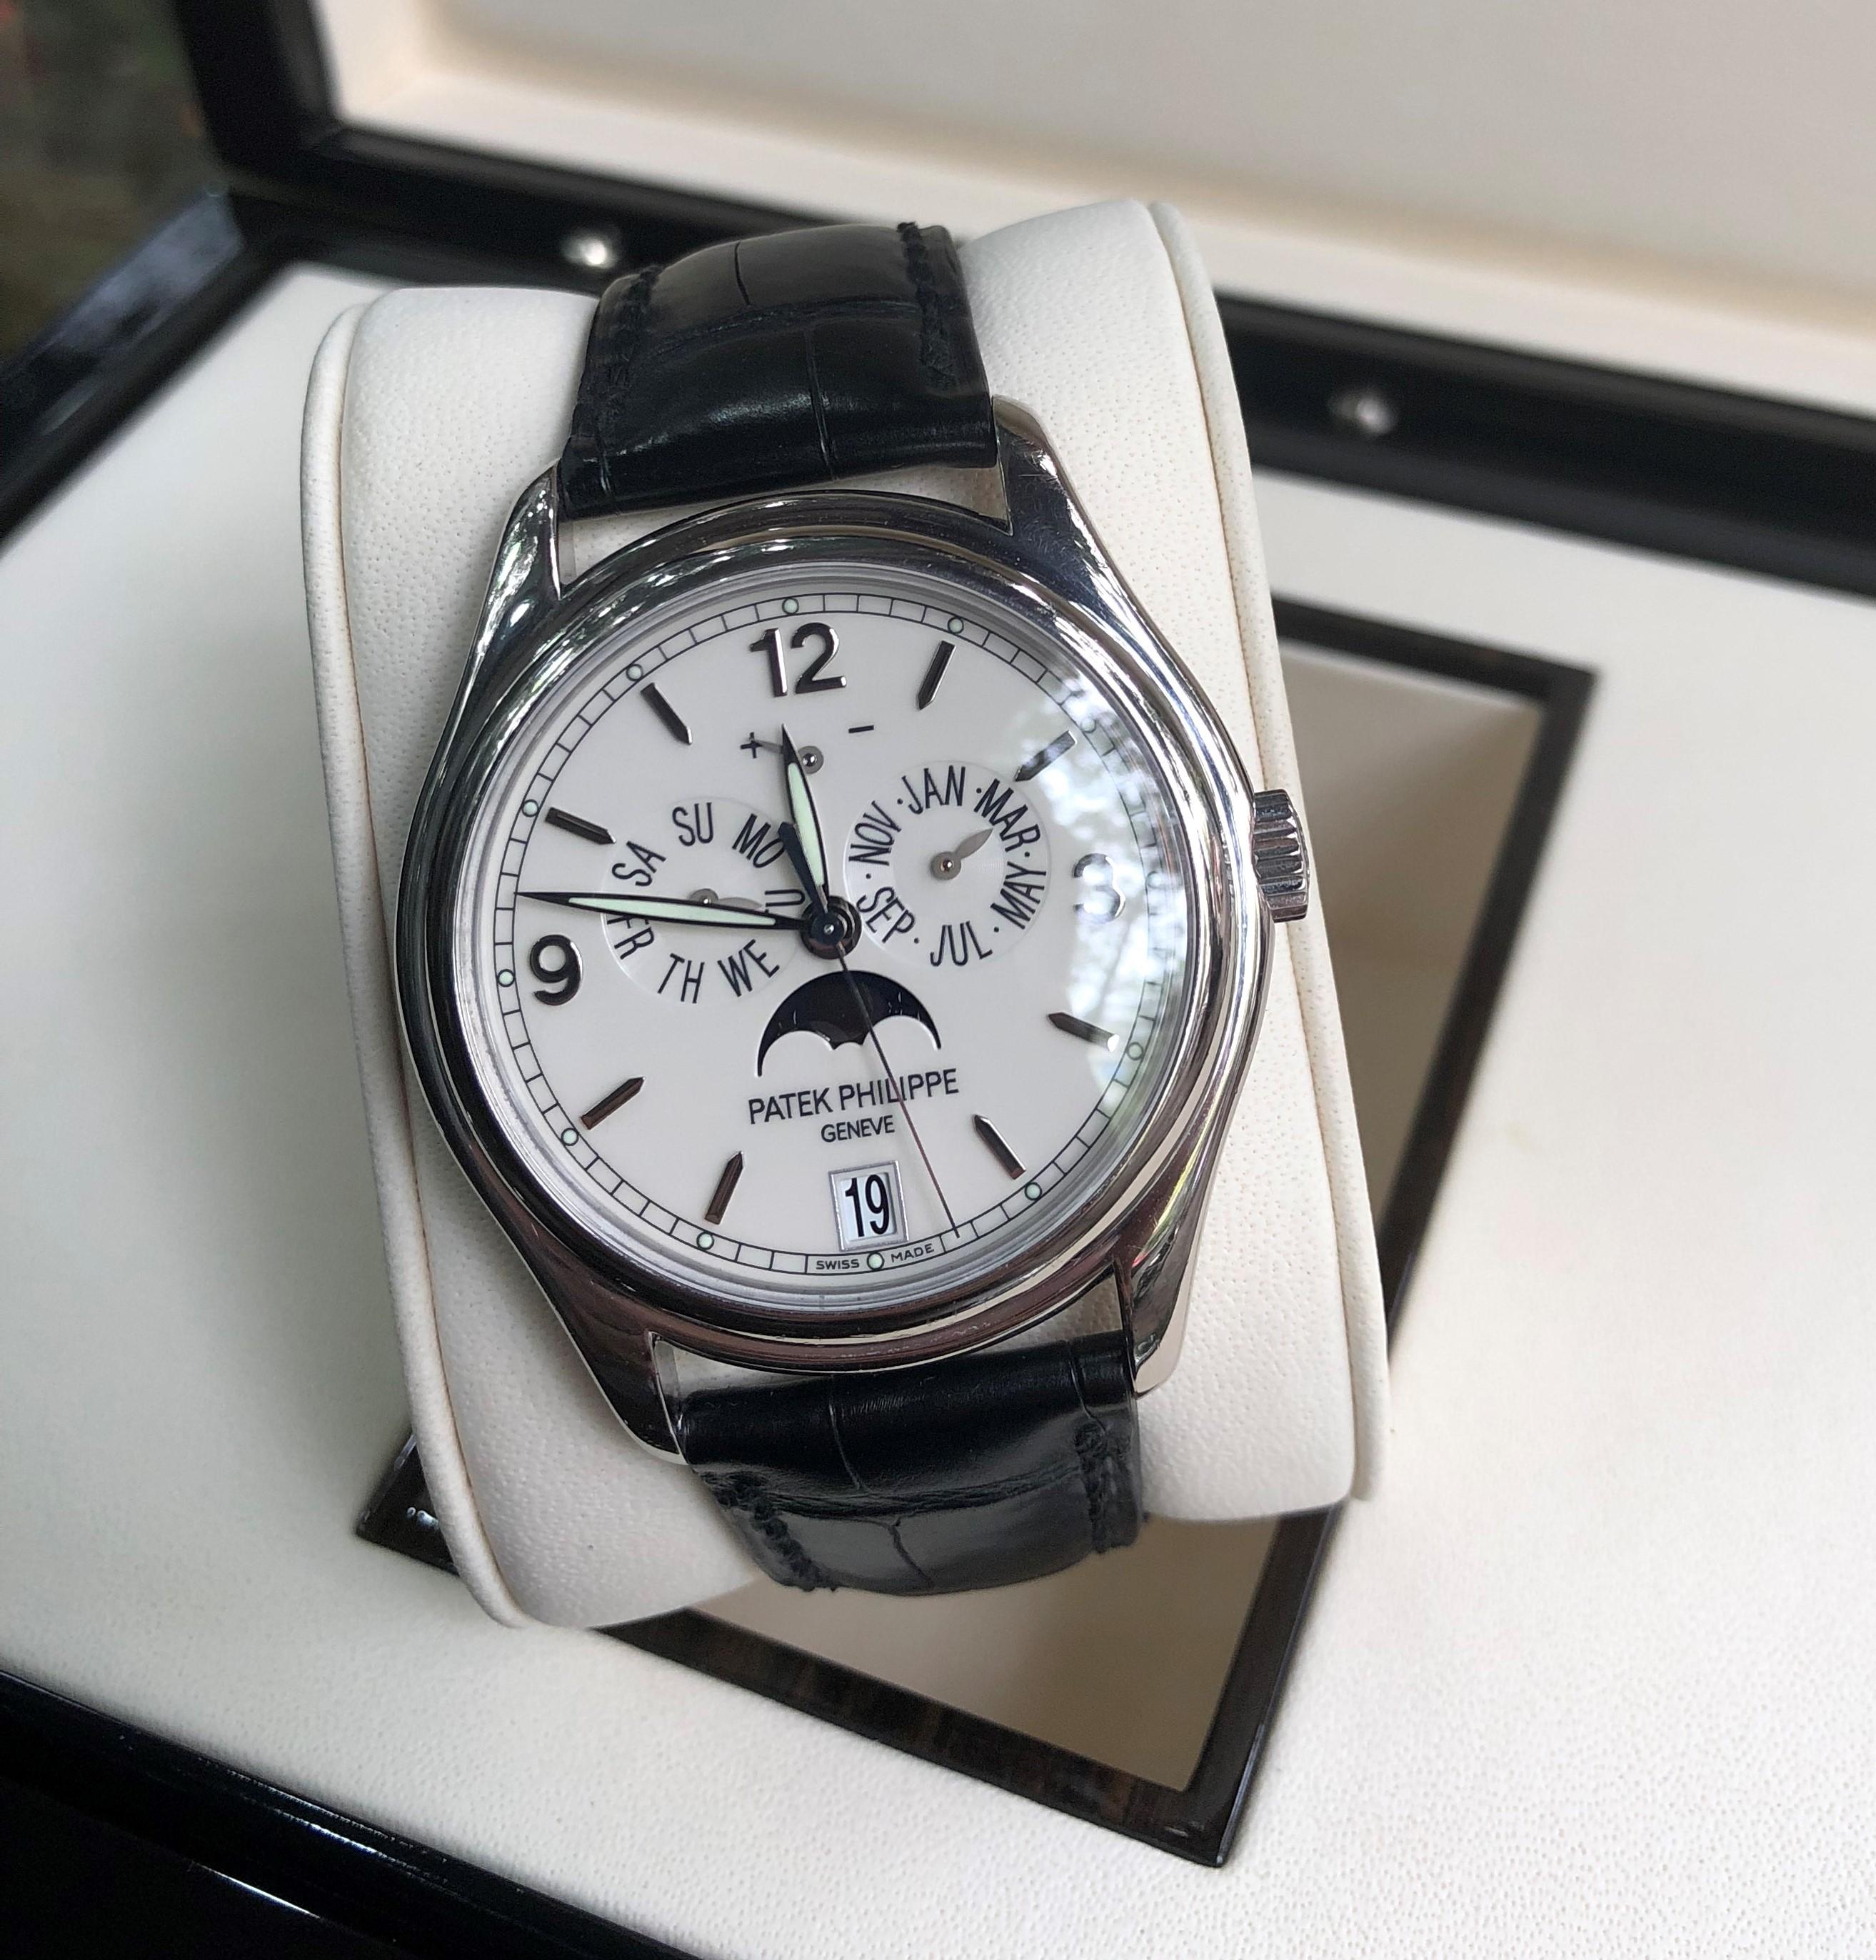 Đồng hồ Patek philippe 5146G-001